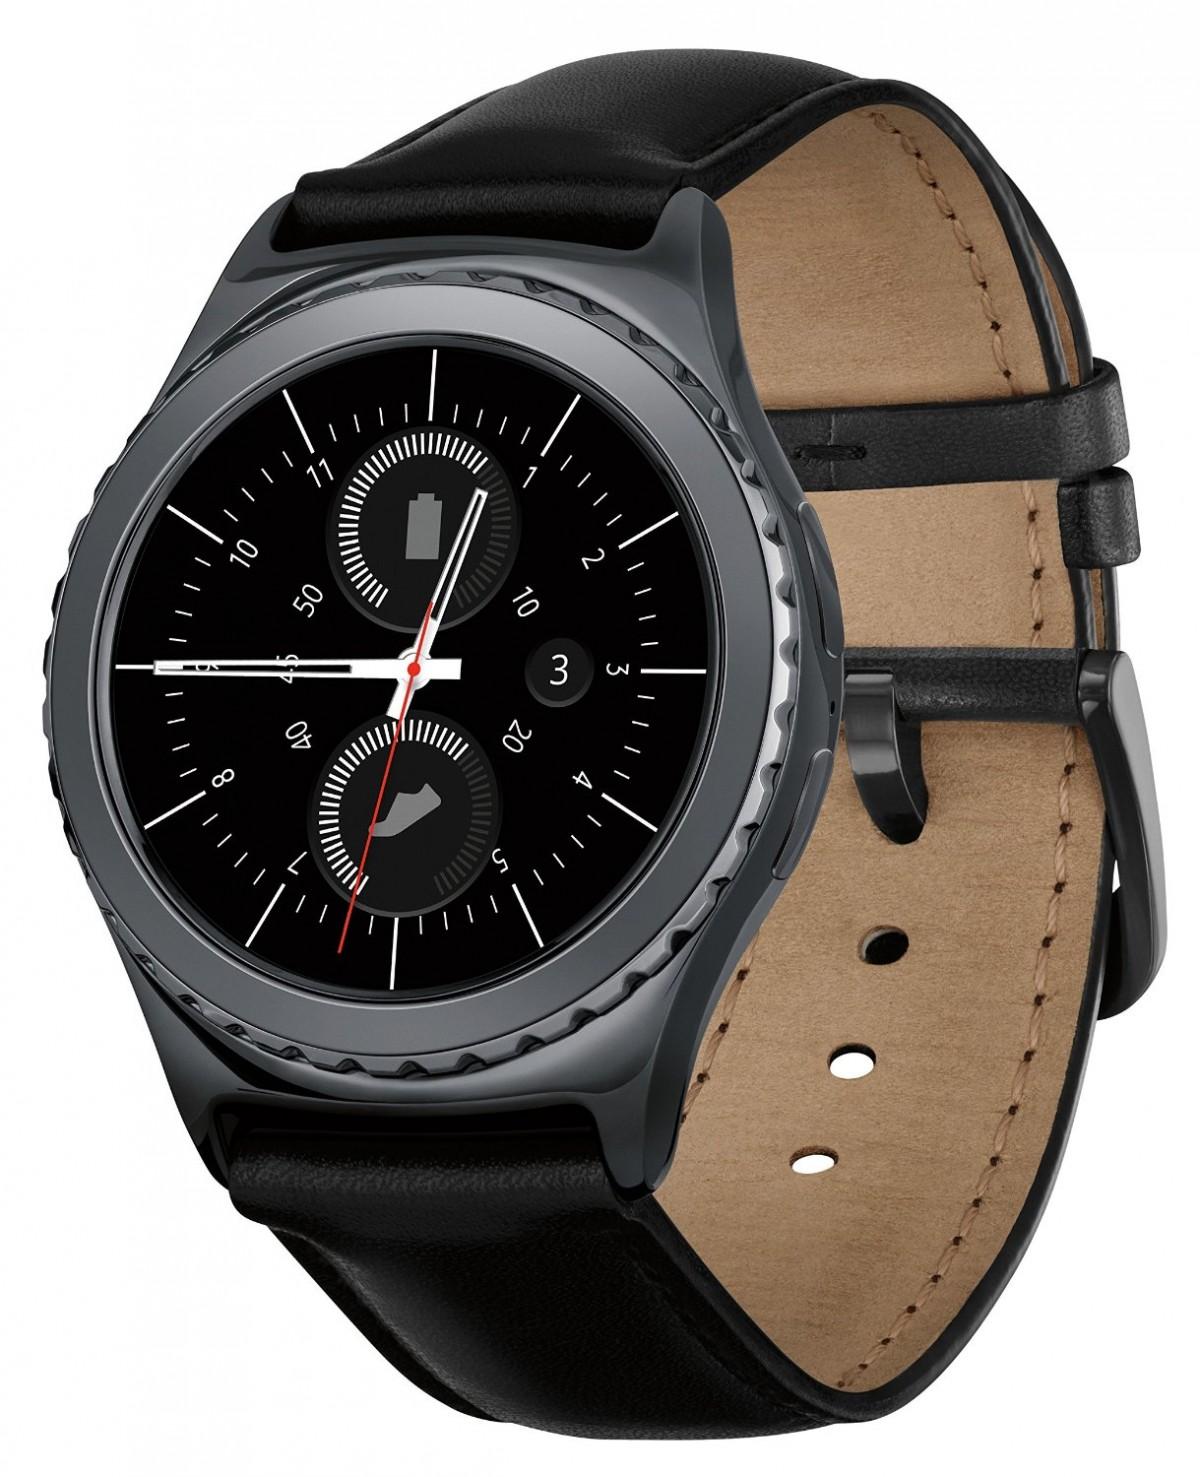 Samsung Gear S2 Smartwatch Price in Pakistan | Buy Galaxy ...